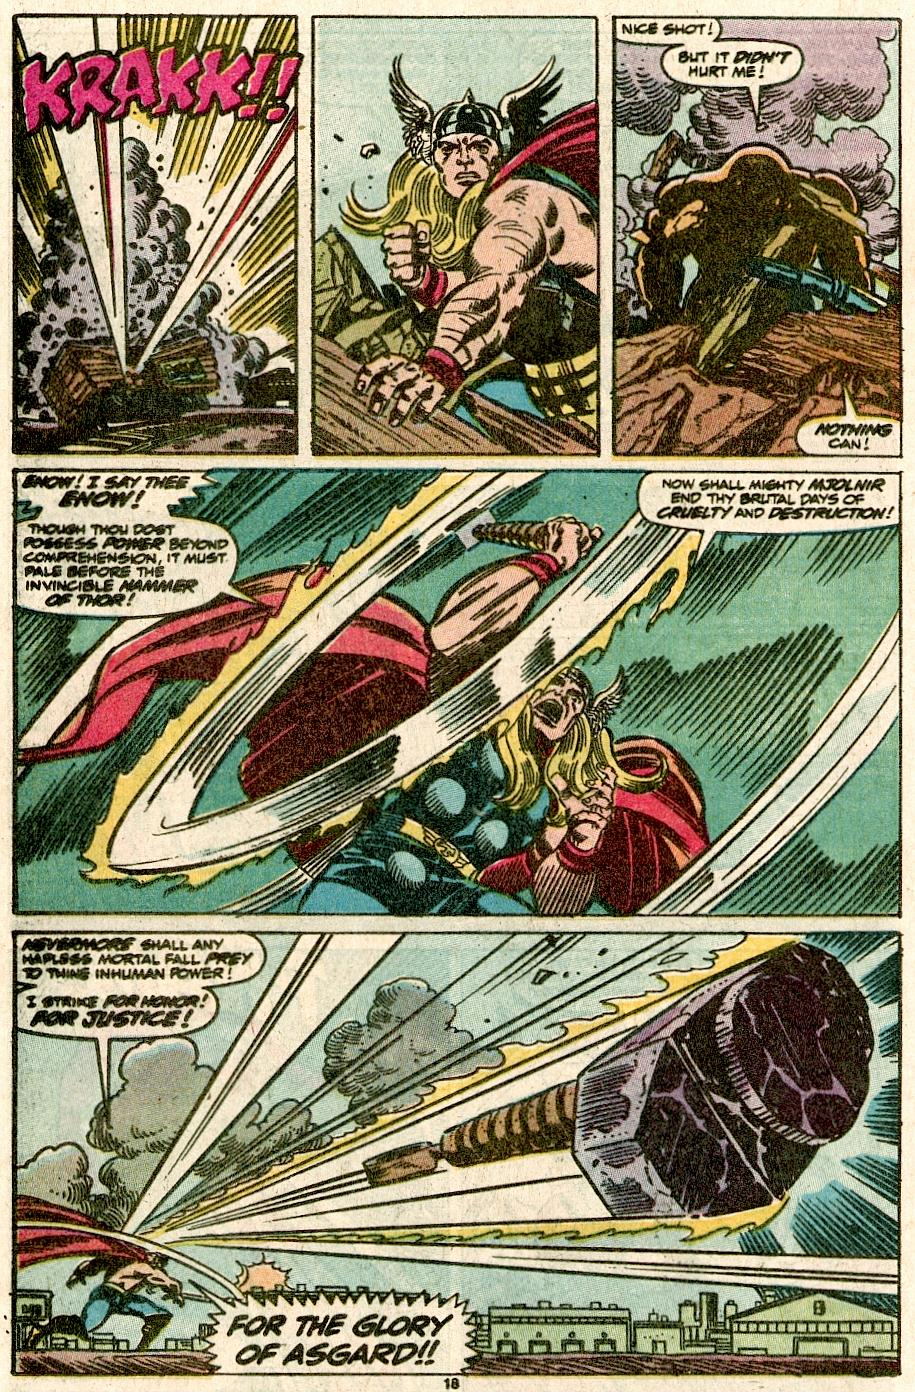 The Mighty Thor vs. Juggernaut